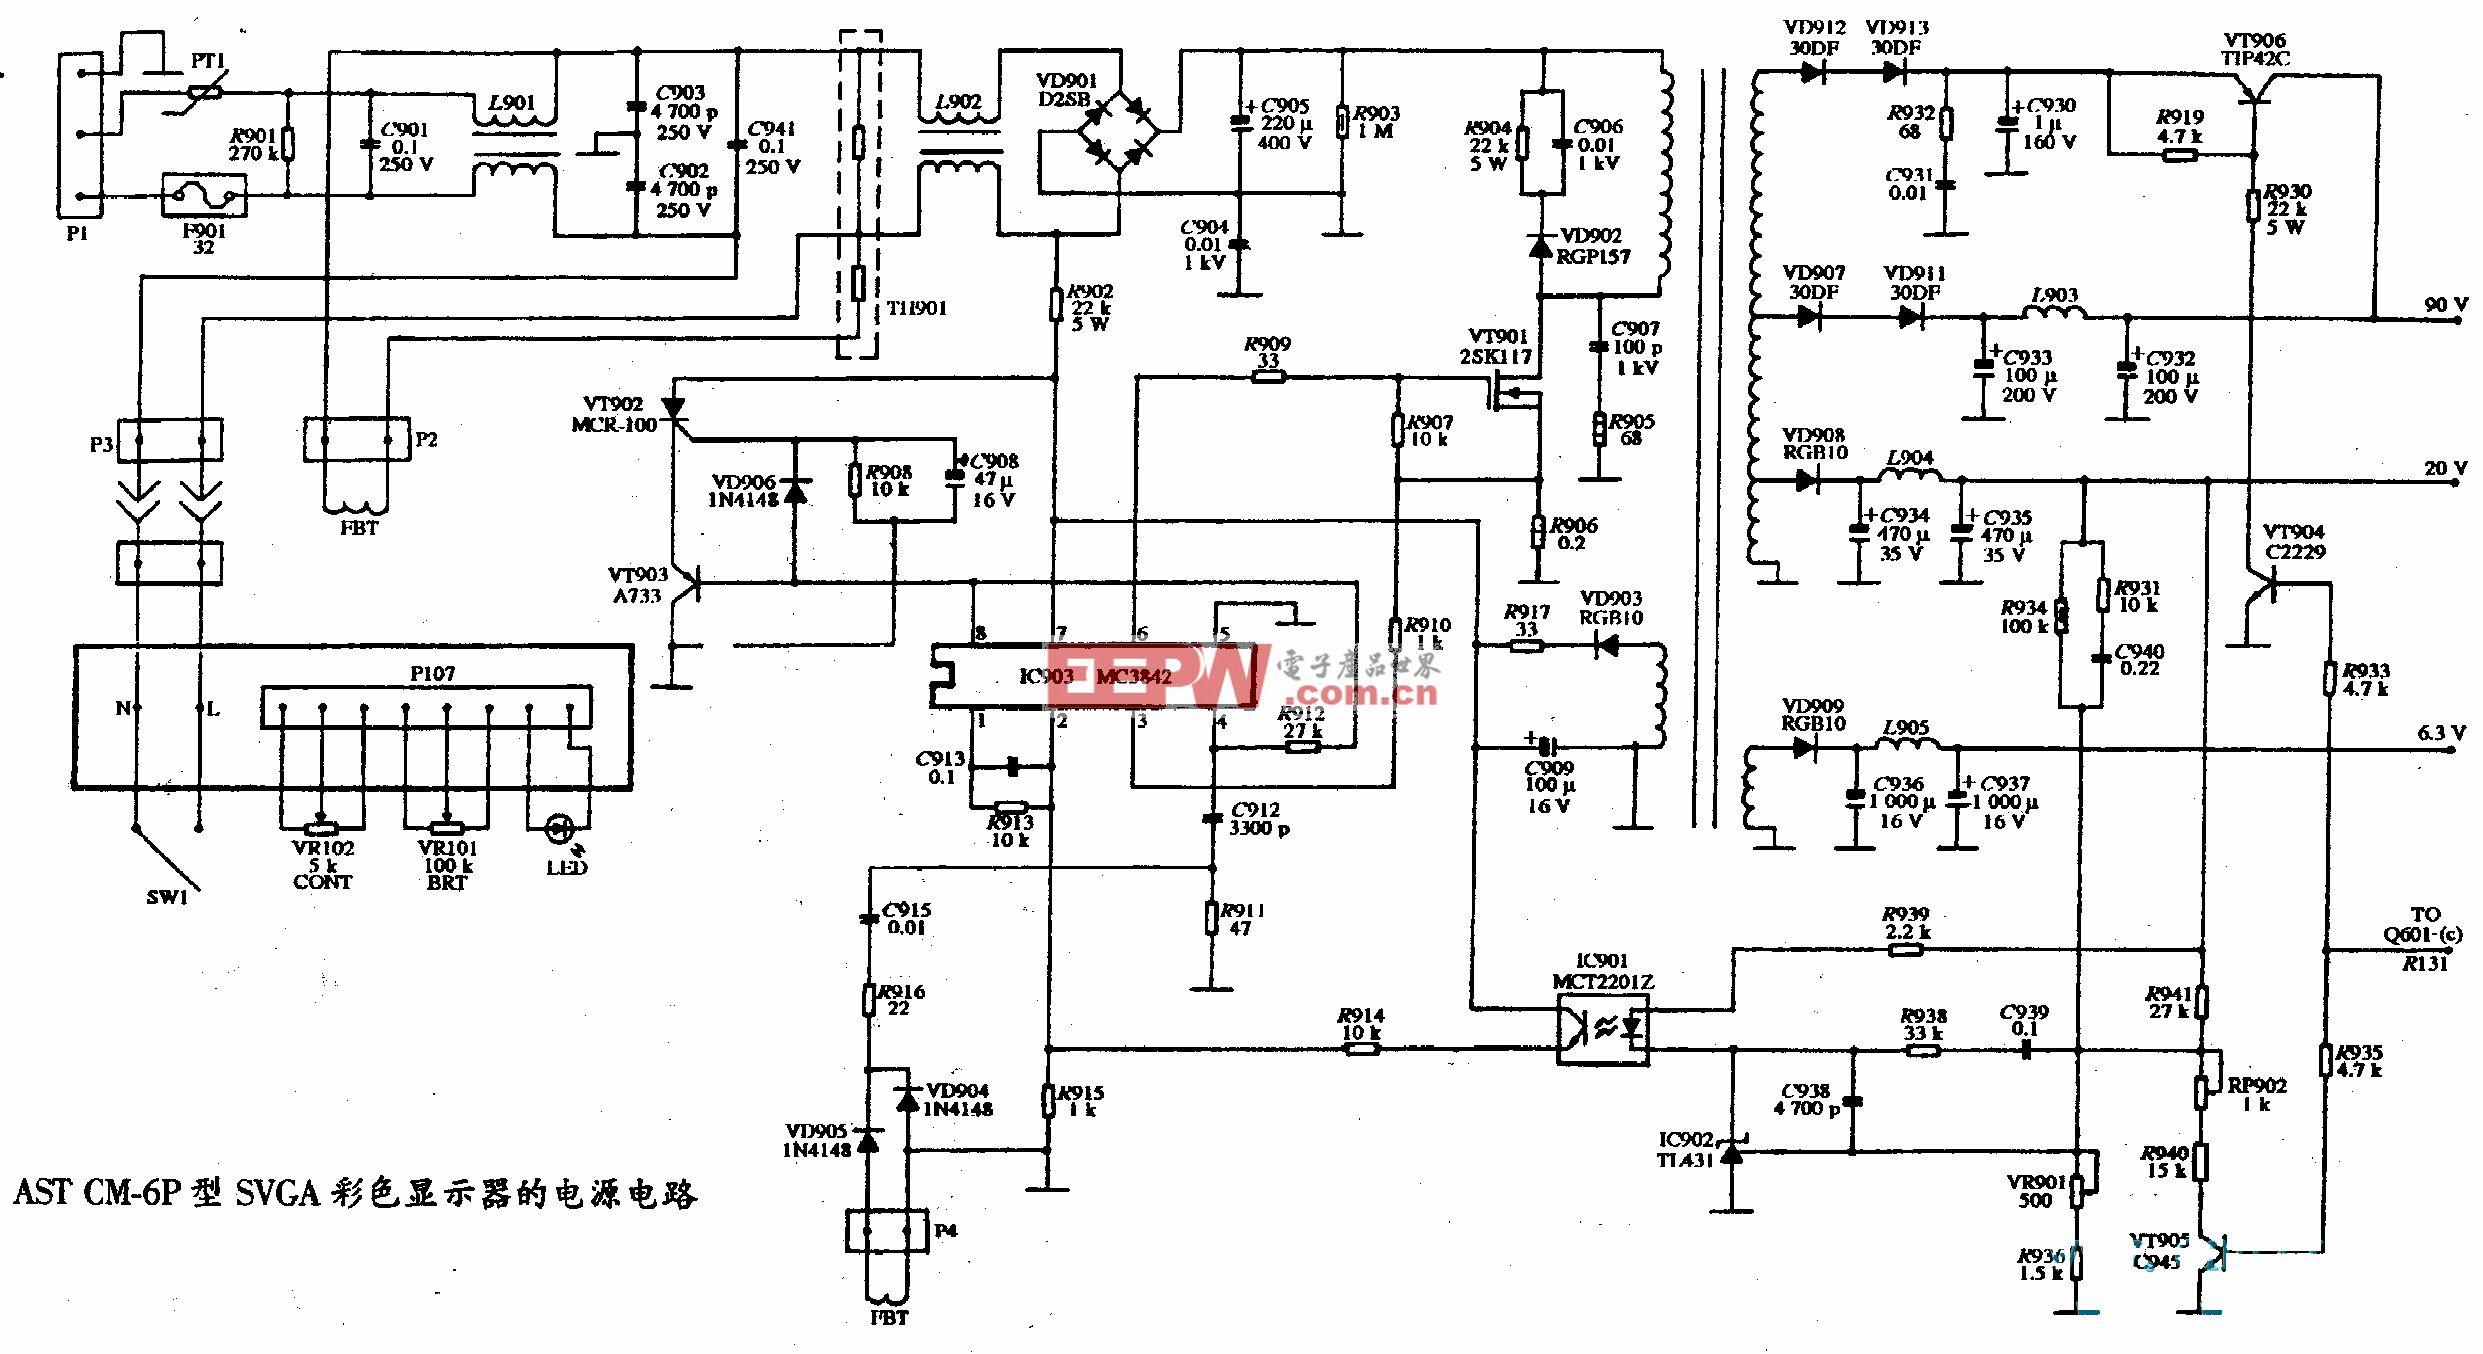 AST CM-6P型SVGA彩色显示器的电源电路图